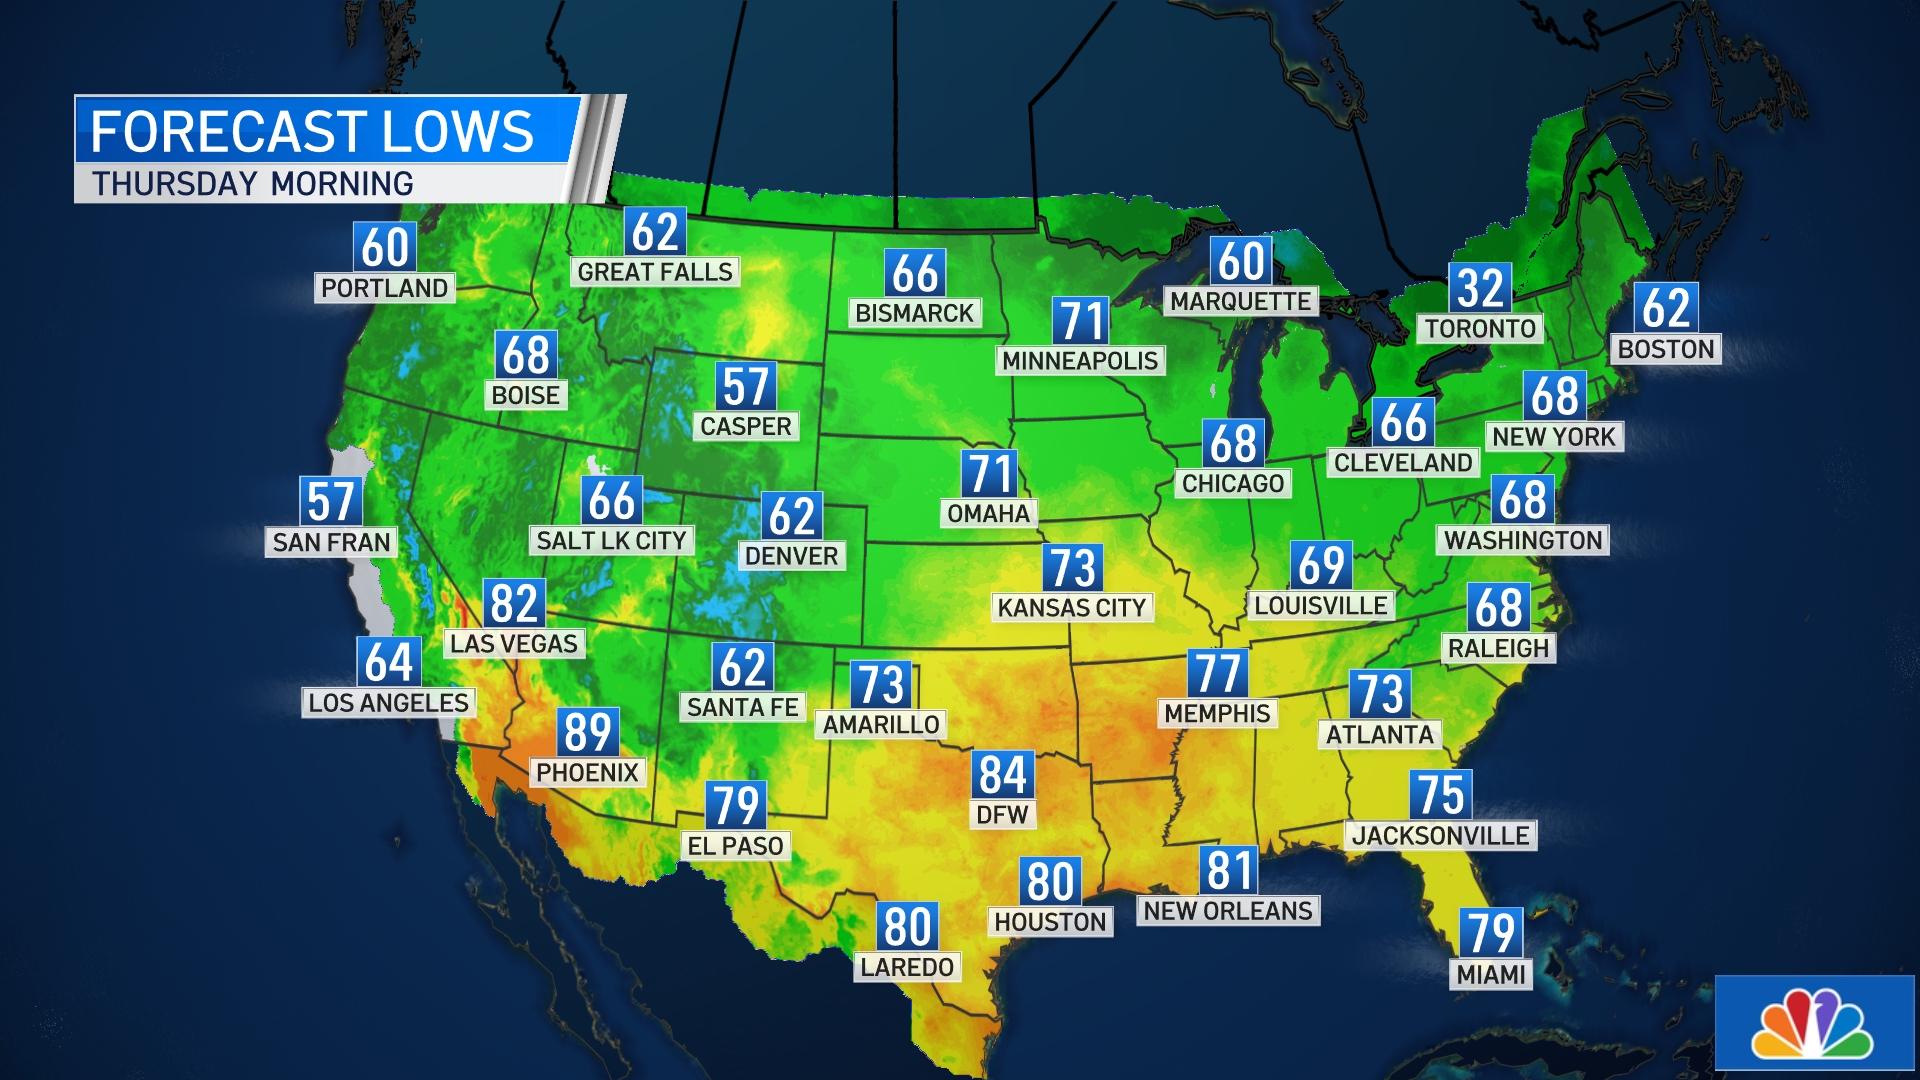 National Forecast Low Temperatures